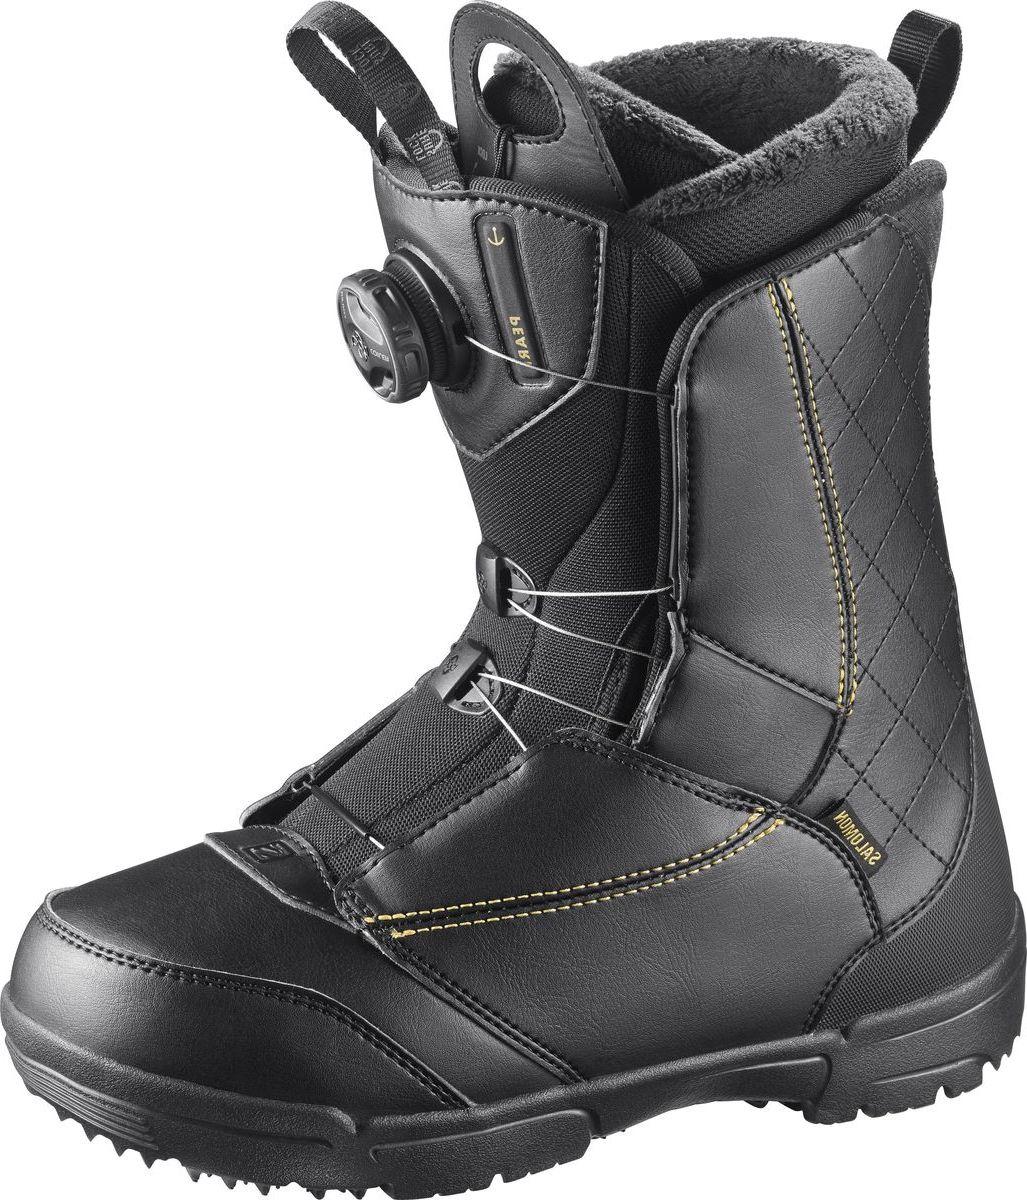 Ботинки для сноуборда Salomon Pearl Boa, цвет: черный, золотистый. Размер 26 (39,5) ботинки для сноуборда мужские salomon dialogue цвет черный размер 42